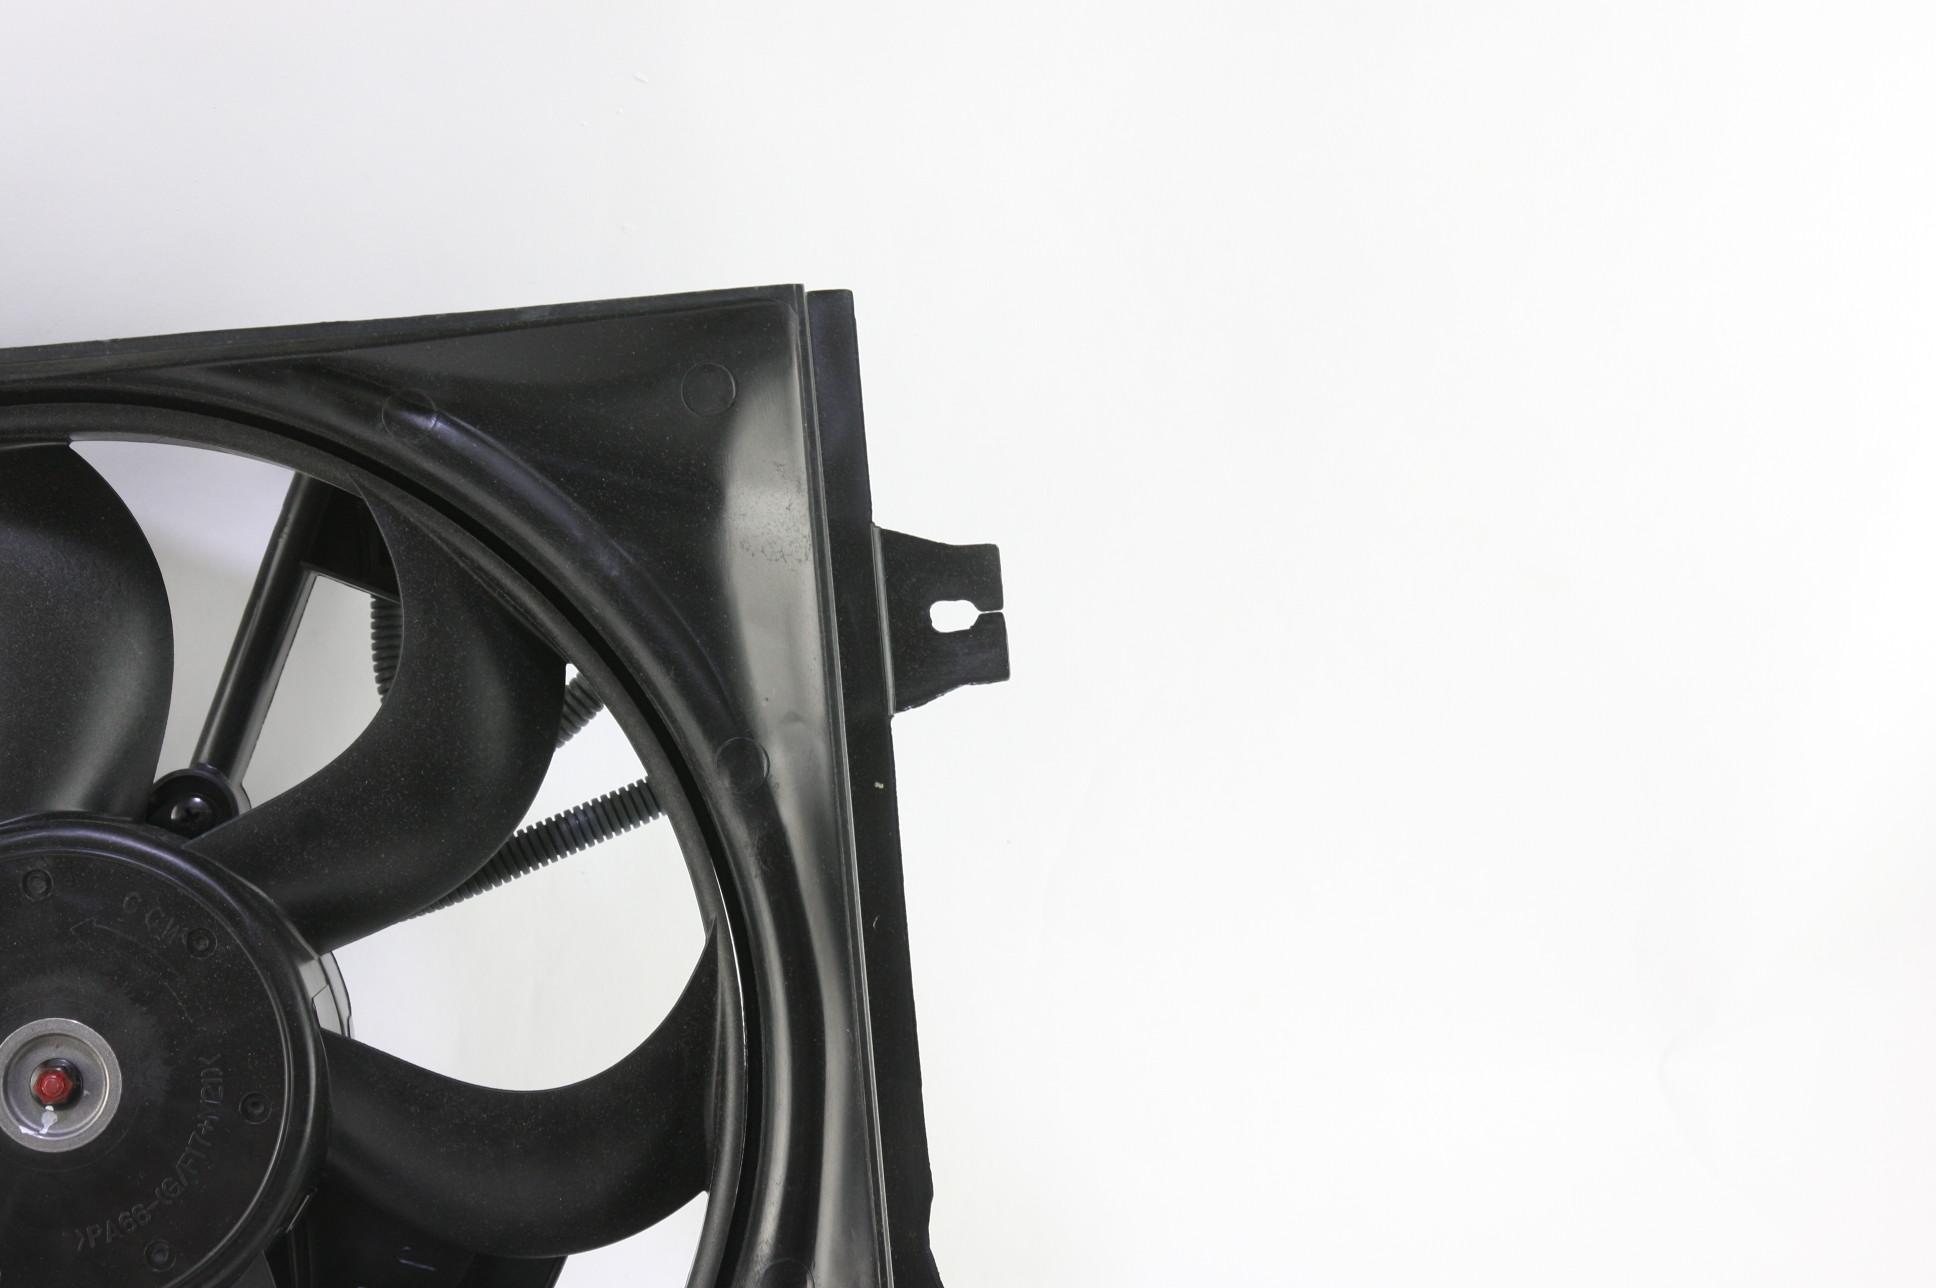 ~ New Kia OEM 977301G000 Kia Rio Radiator Condenser Fan Motor Free Shipping - image 4